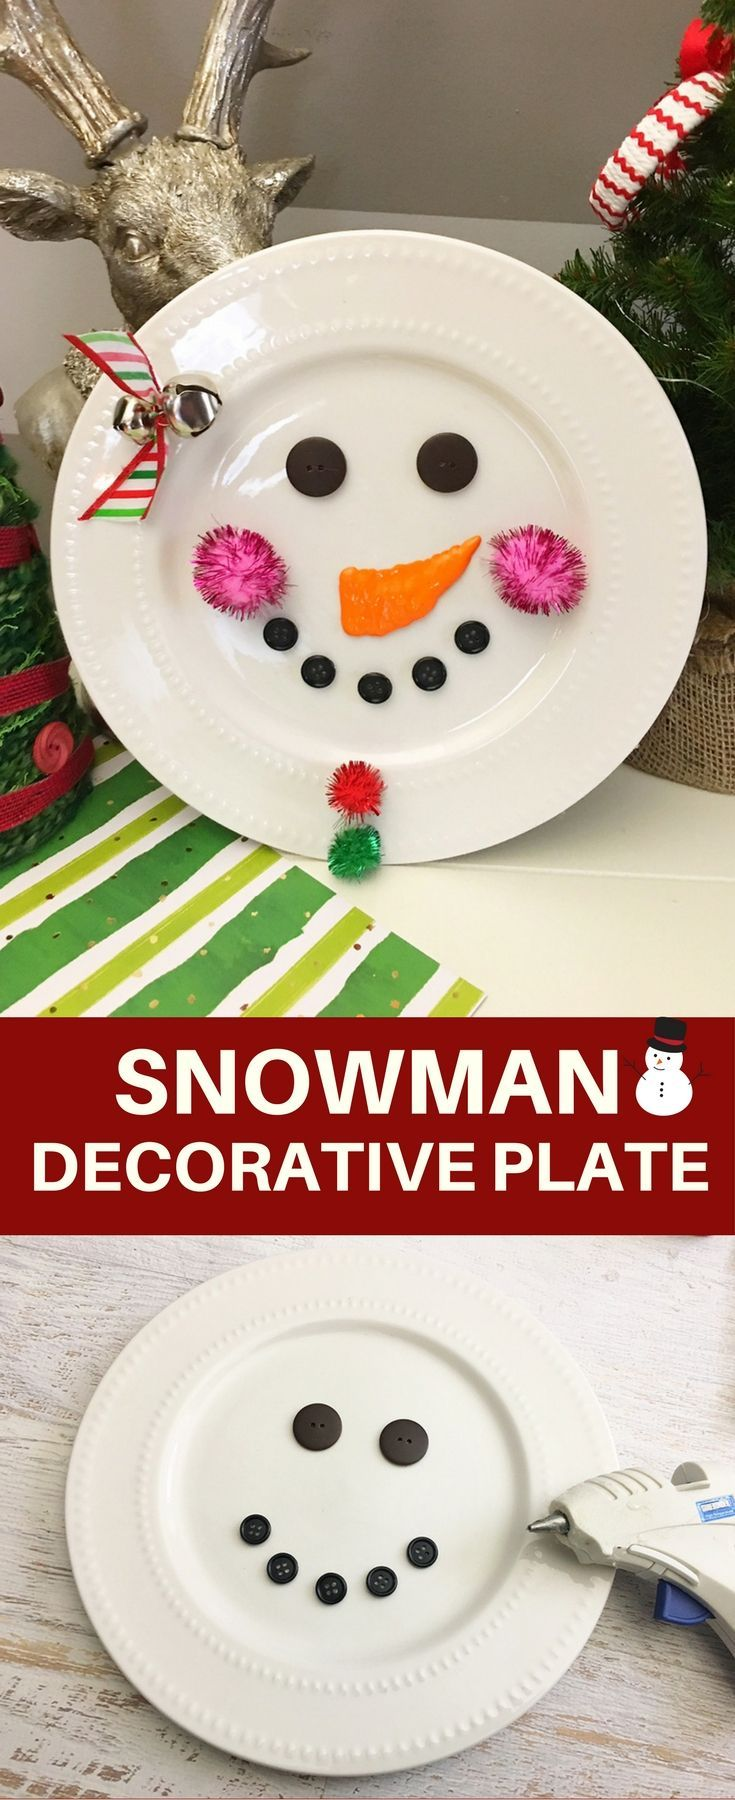 DIY Snowman Decorative Plate Best 1207 christmas